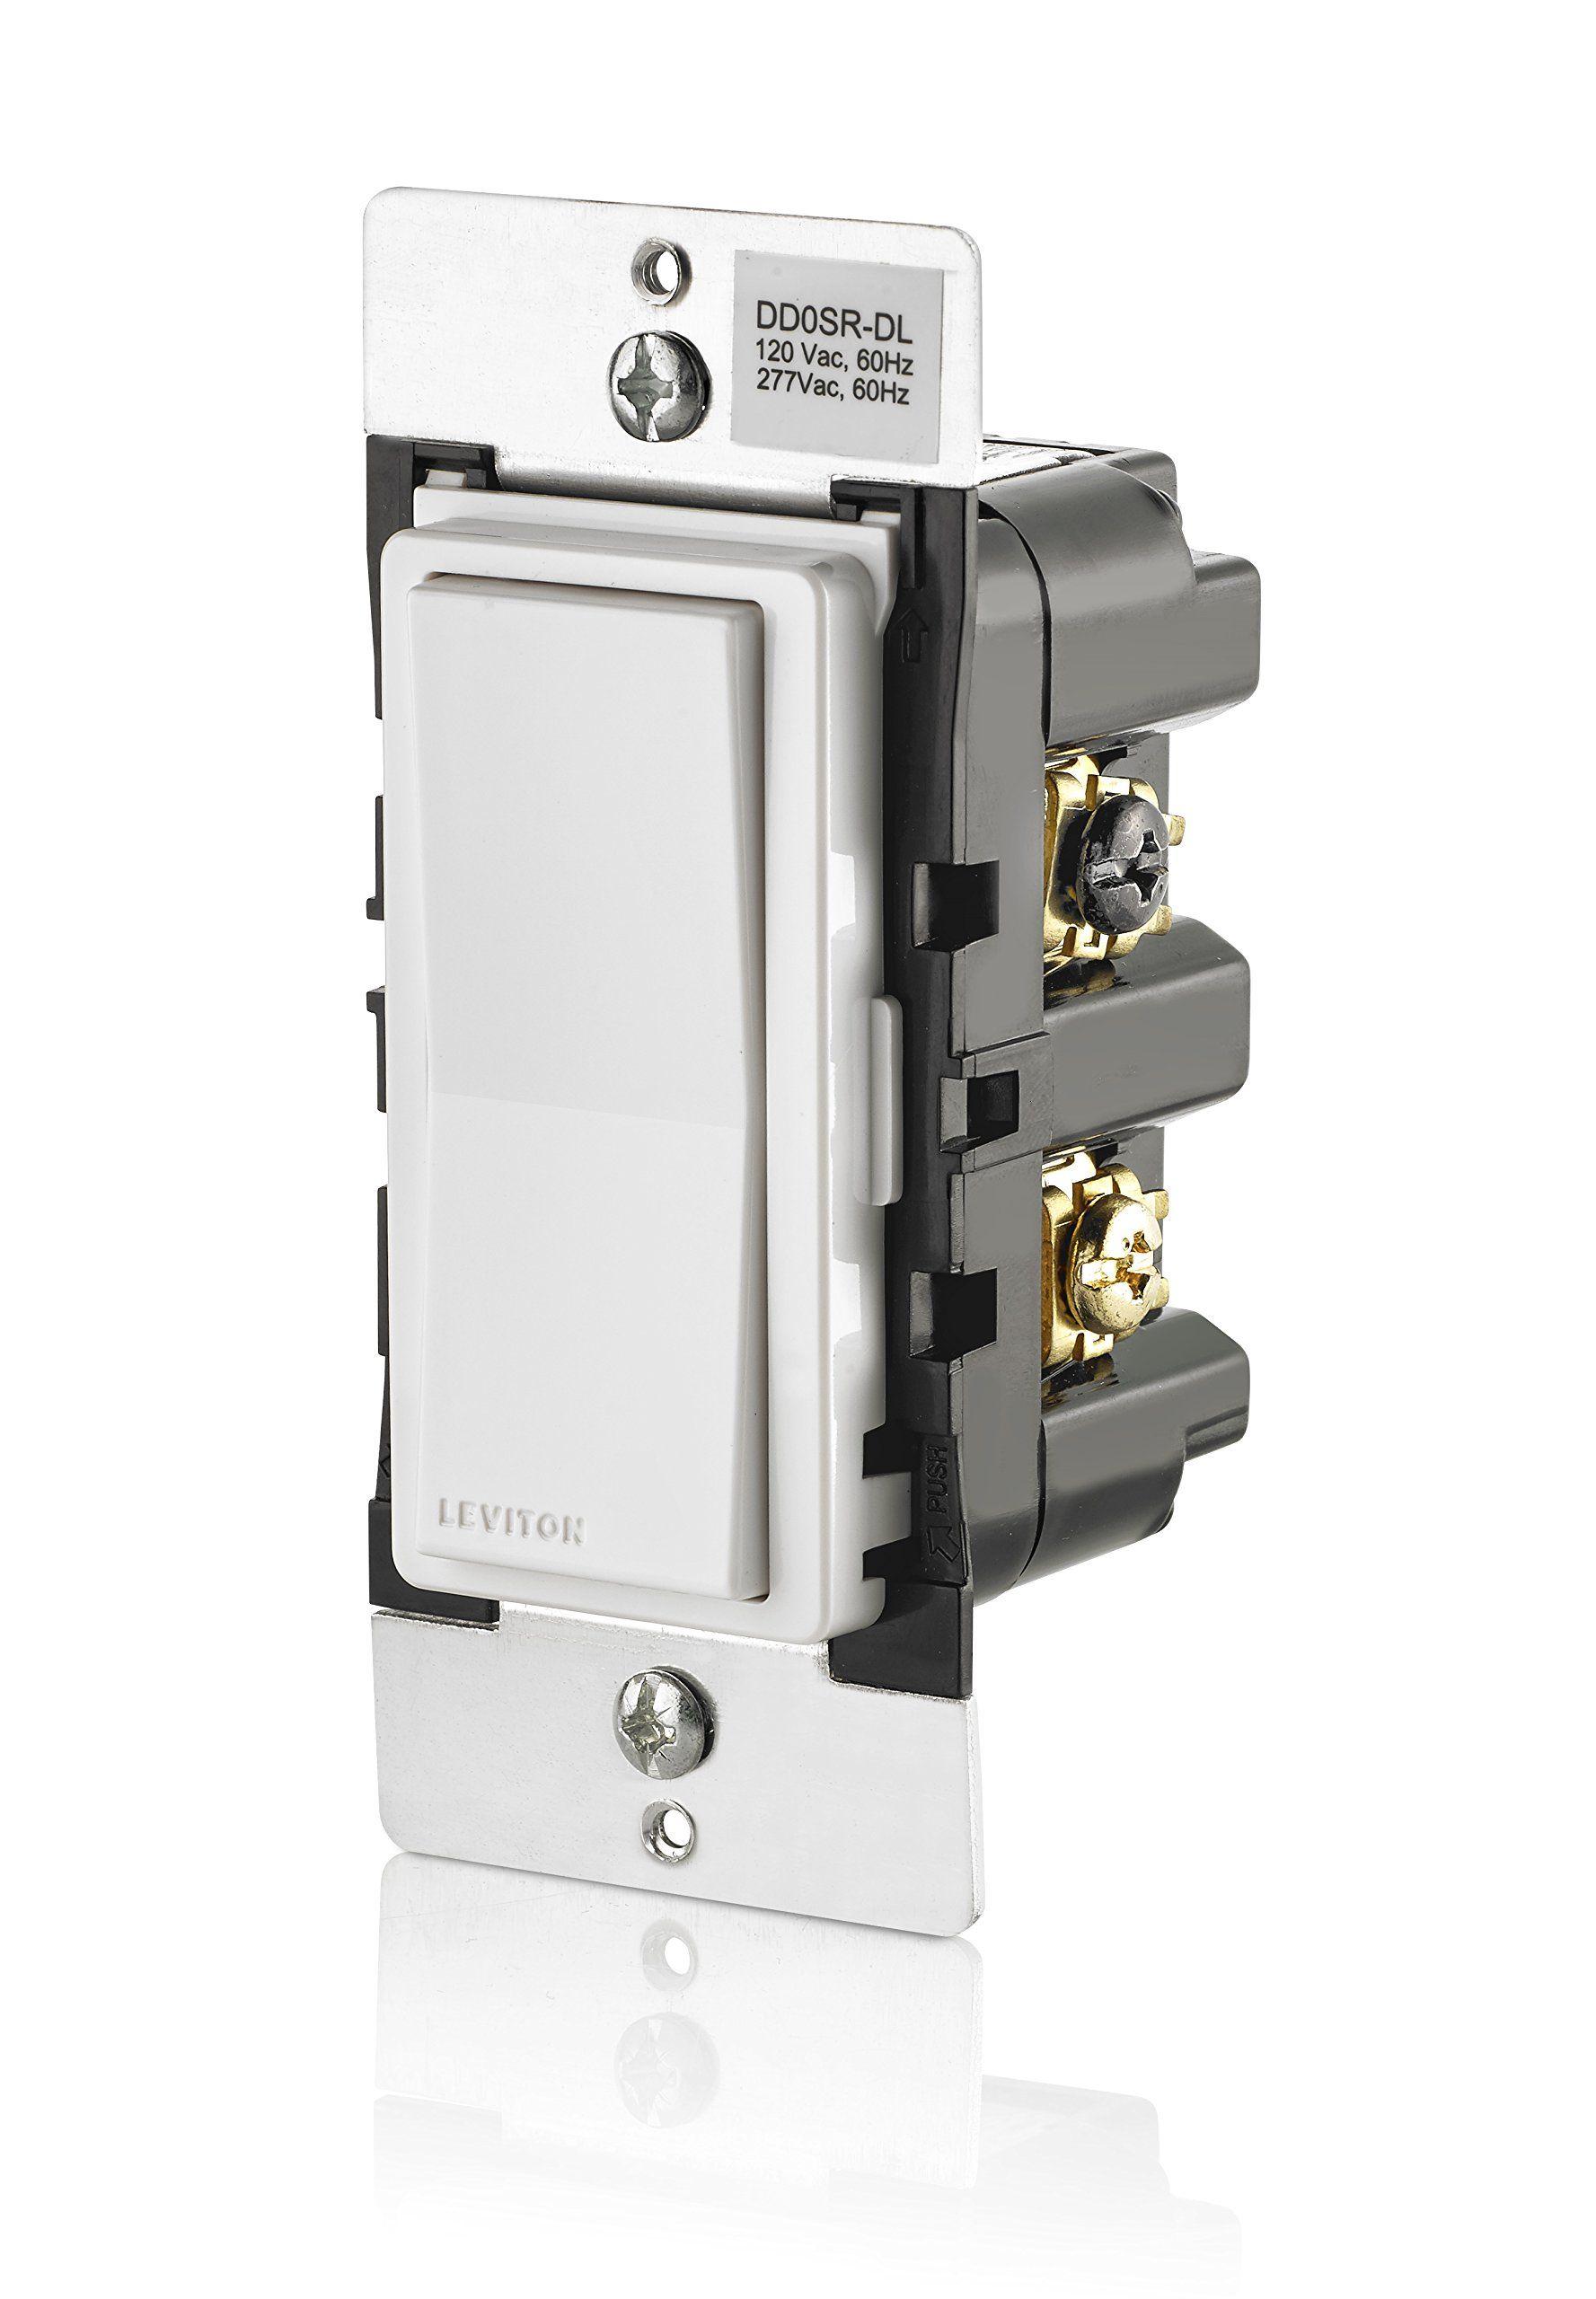 Leviton DD0SRDLZ Dual Voltage 120/277VAC Decora Digital/Decora Smart ...